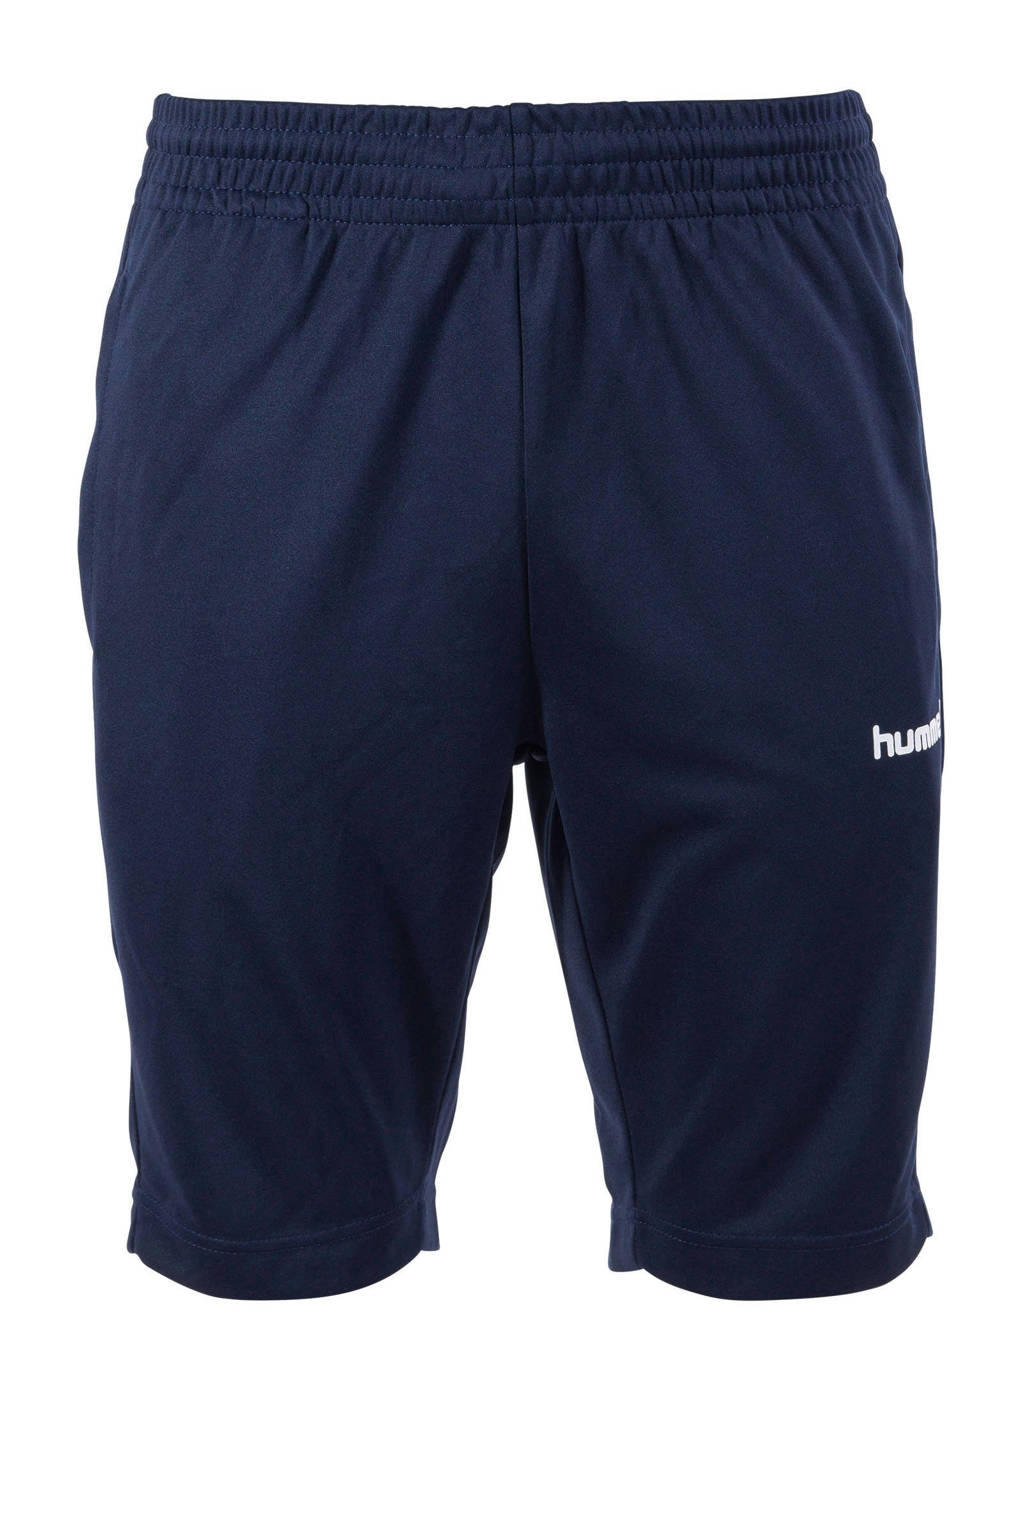 hummel Senior  voetbalshort donkerblauw, Donkerblauw